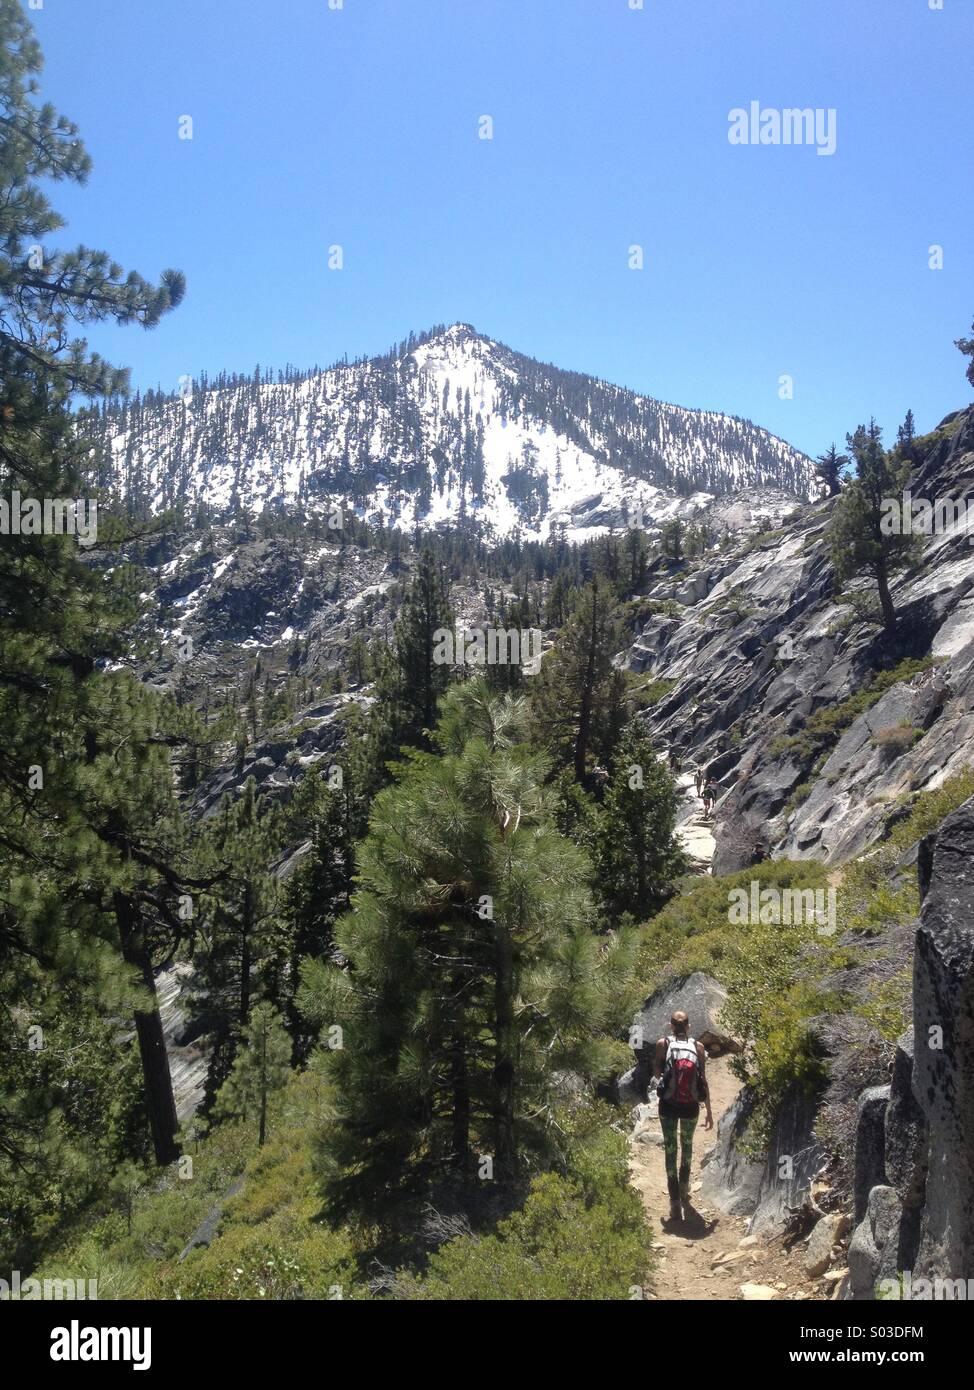 Hiking trail to cascade falls in Lake Tahoe California. Stock Photo